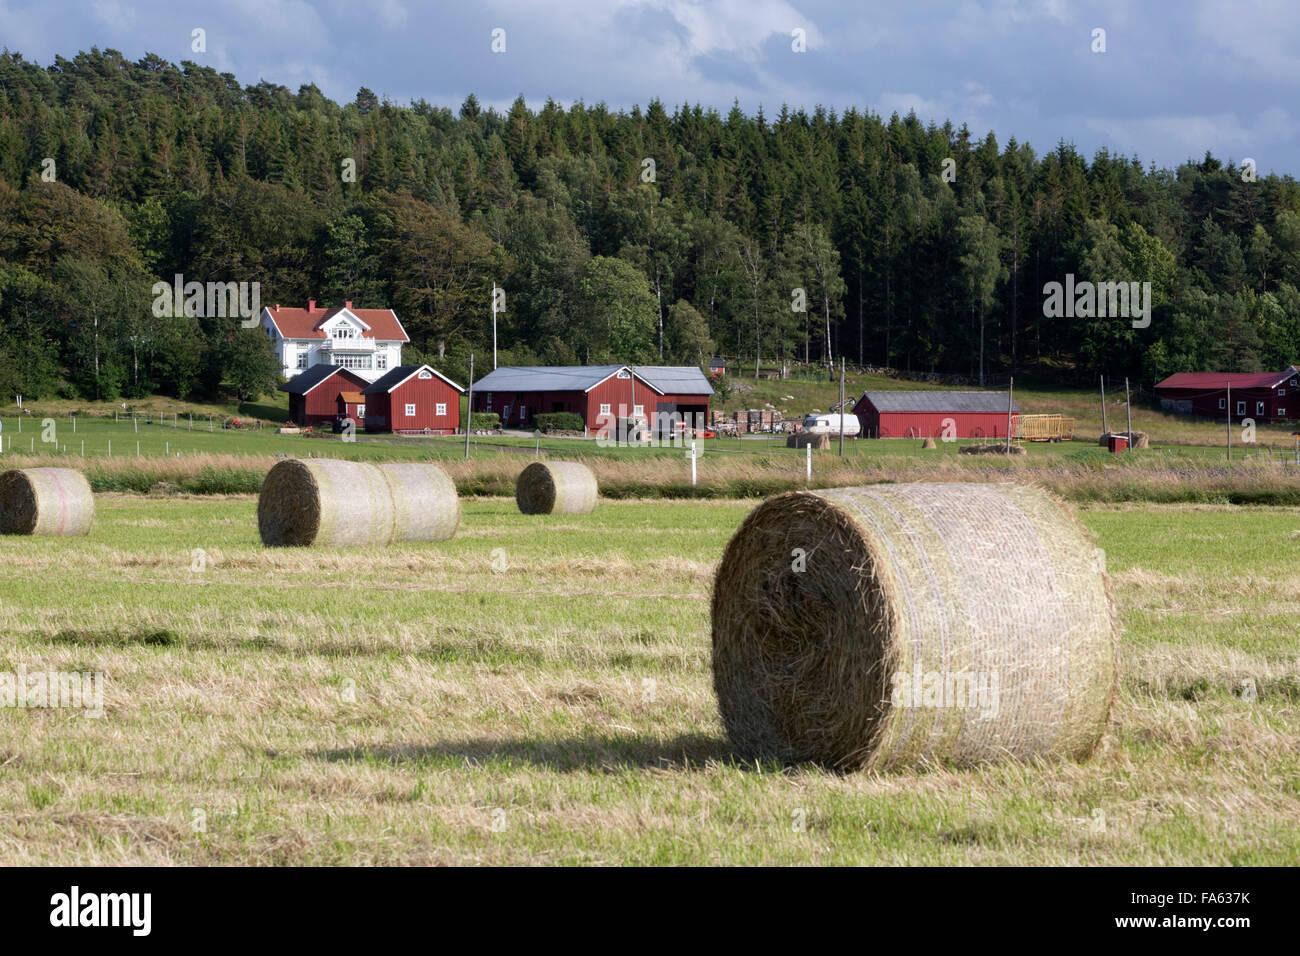 Typical Swedish farm with round hay bales, near Kode, Bohuslan, southwest Sweden, Sweden, Europe - Stock Image